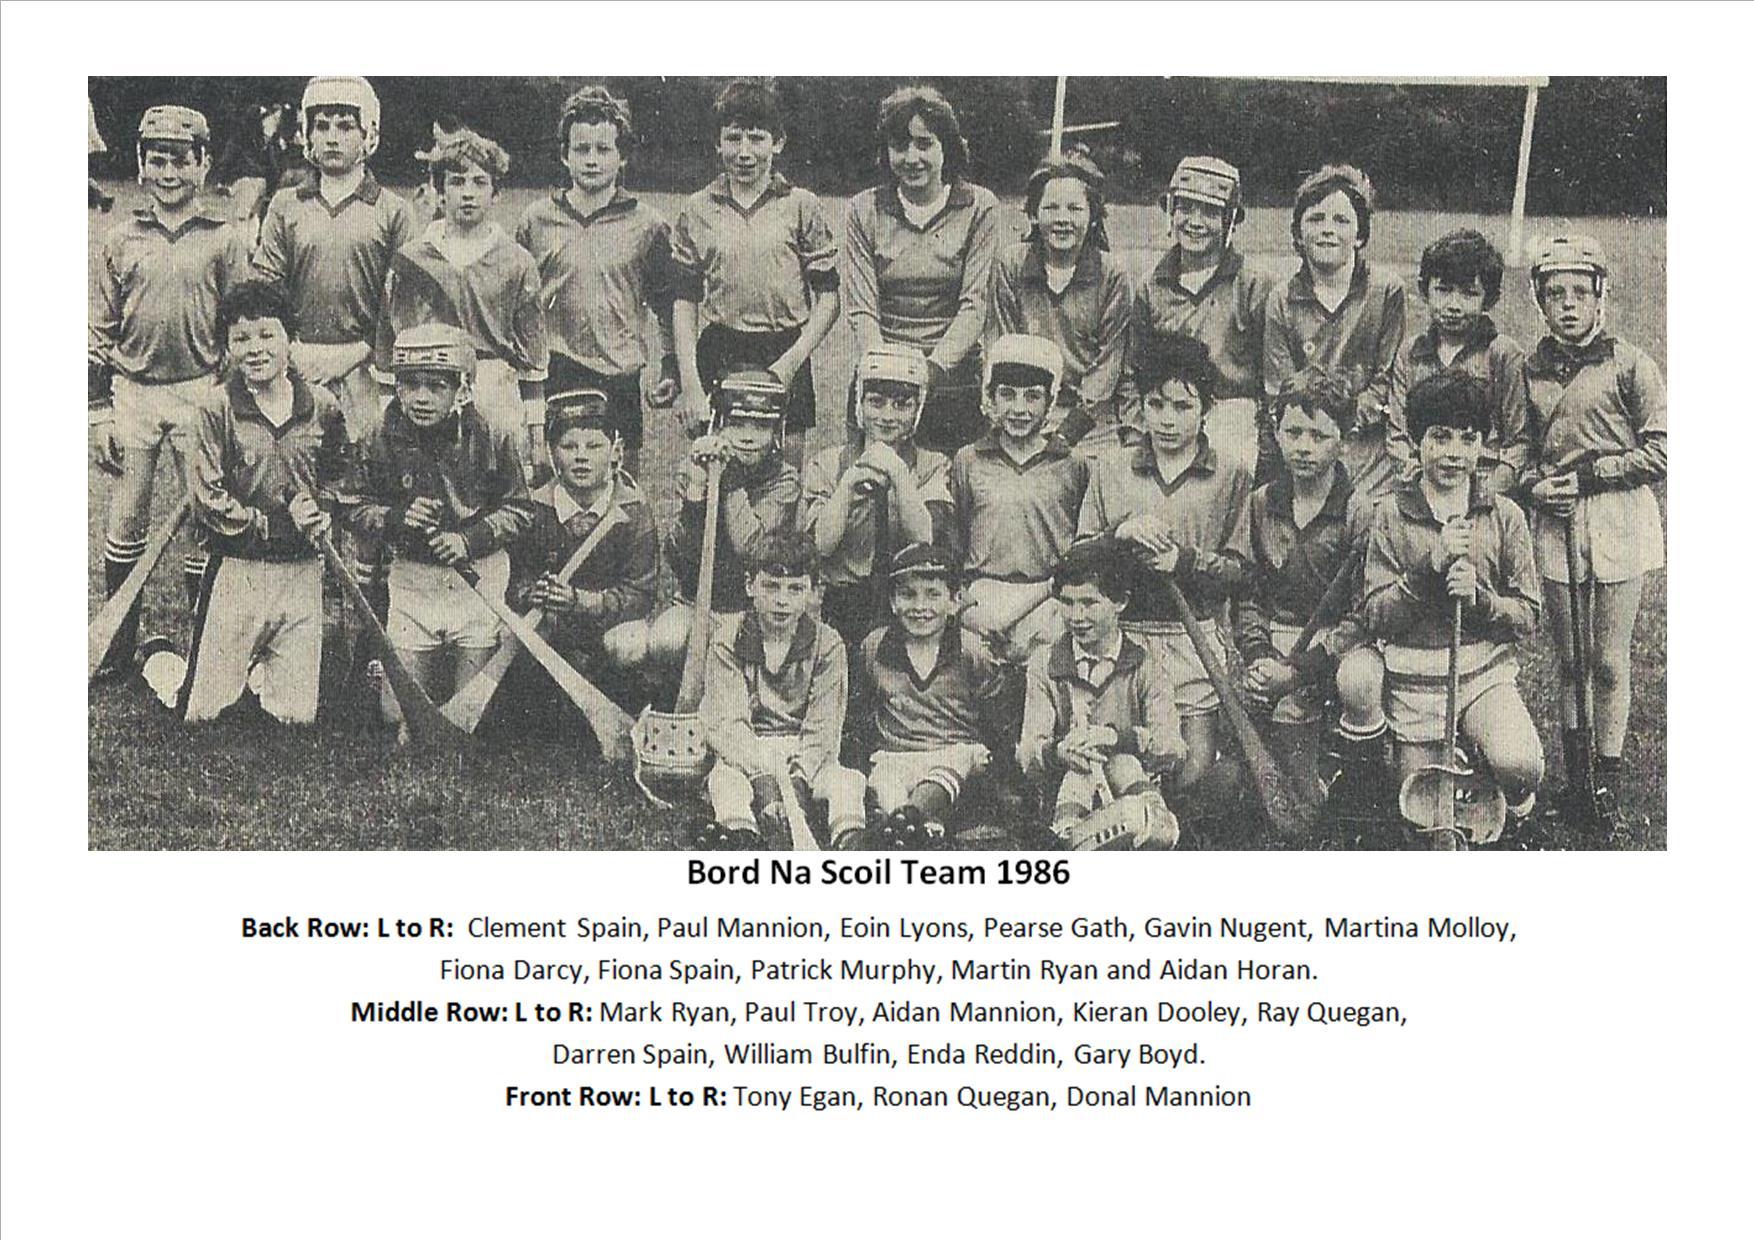 Bord Na Scoil Team 1986